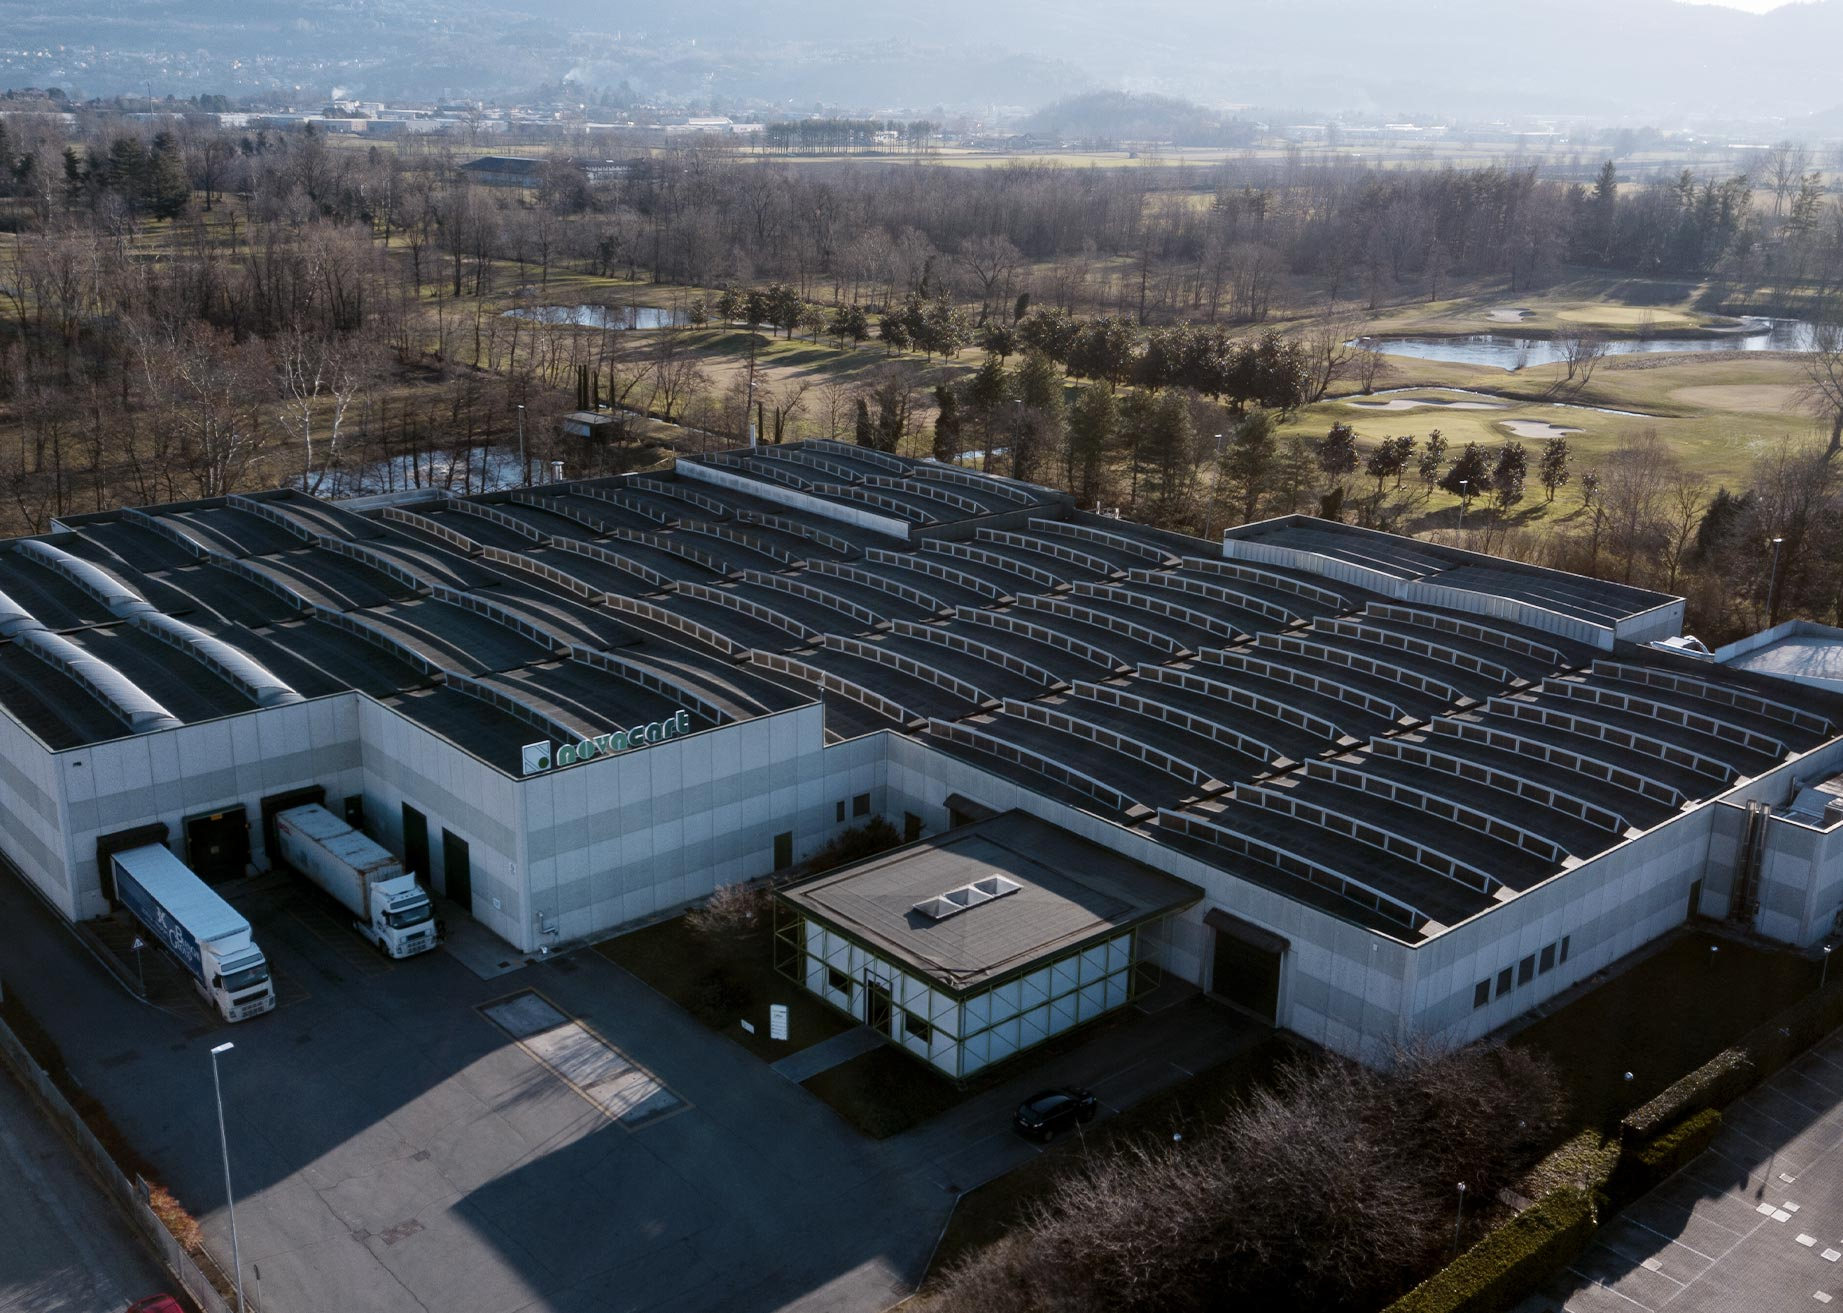 Novacart Italy Bosisio Parini factory